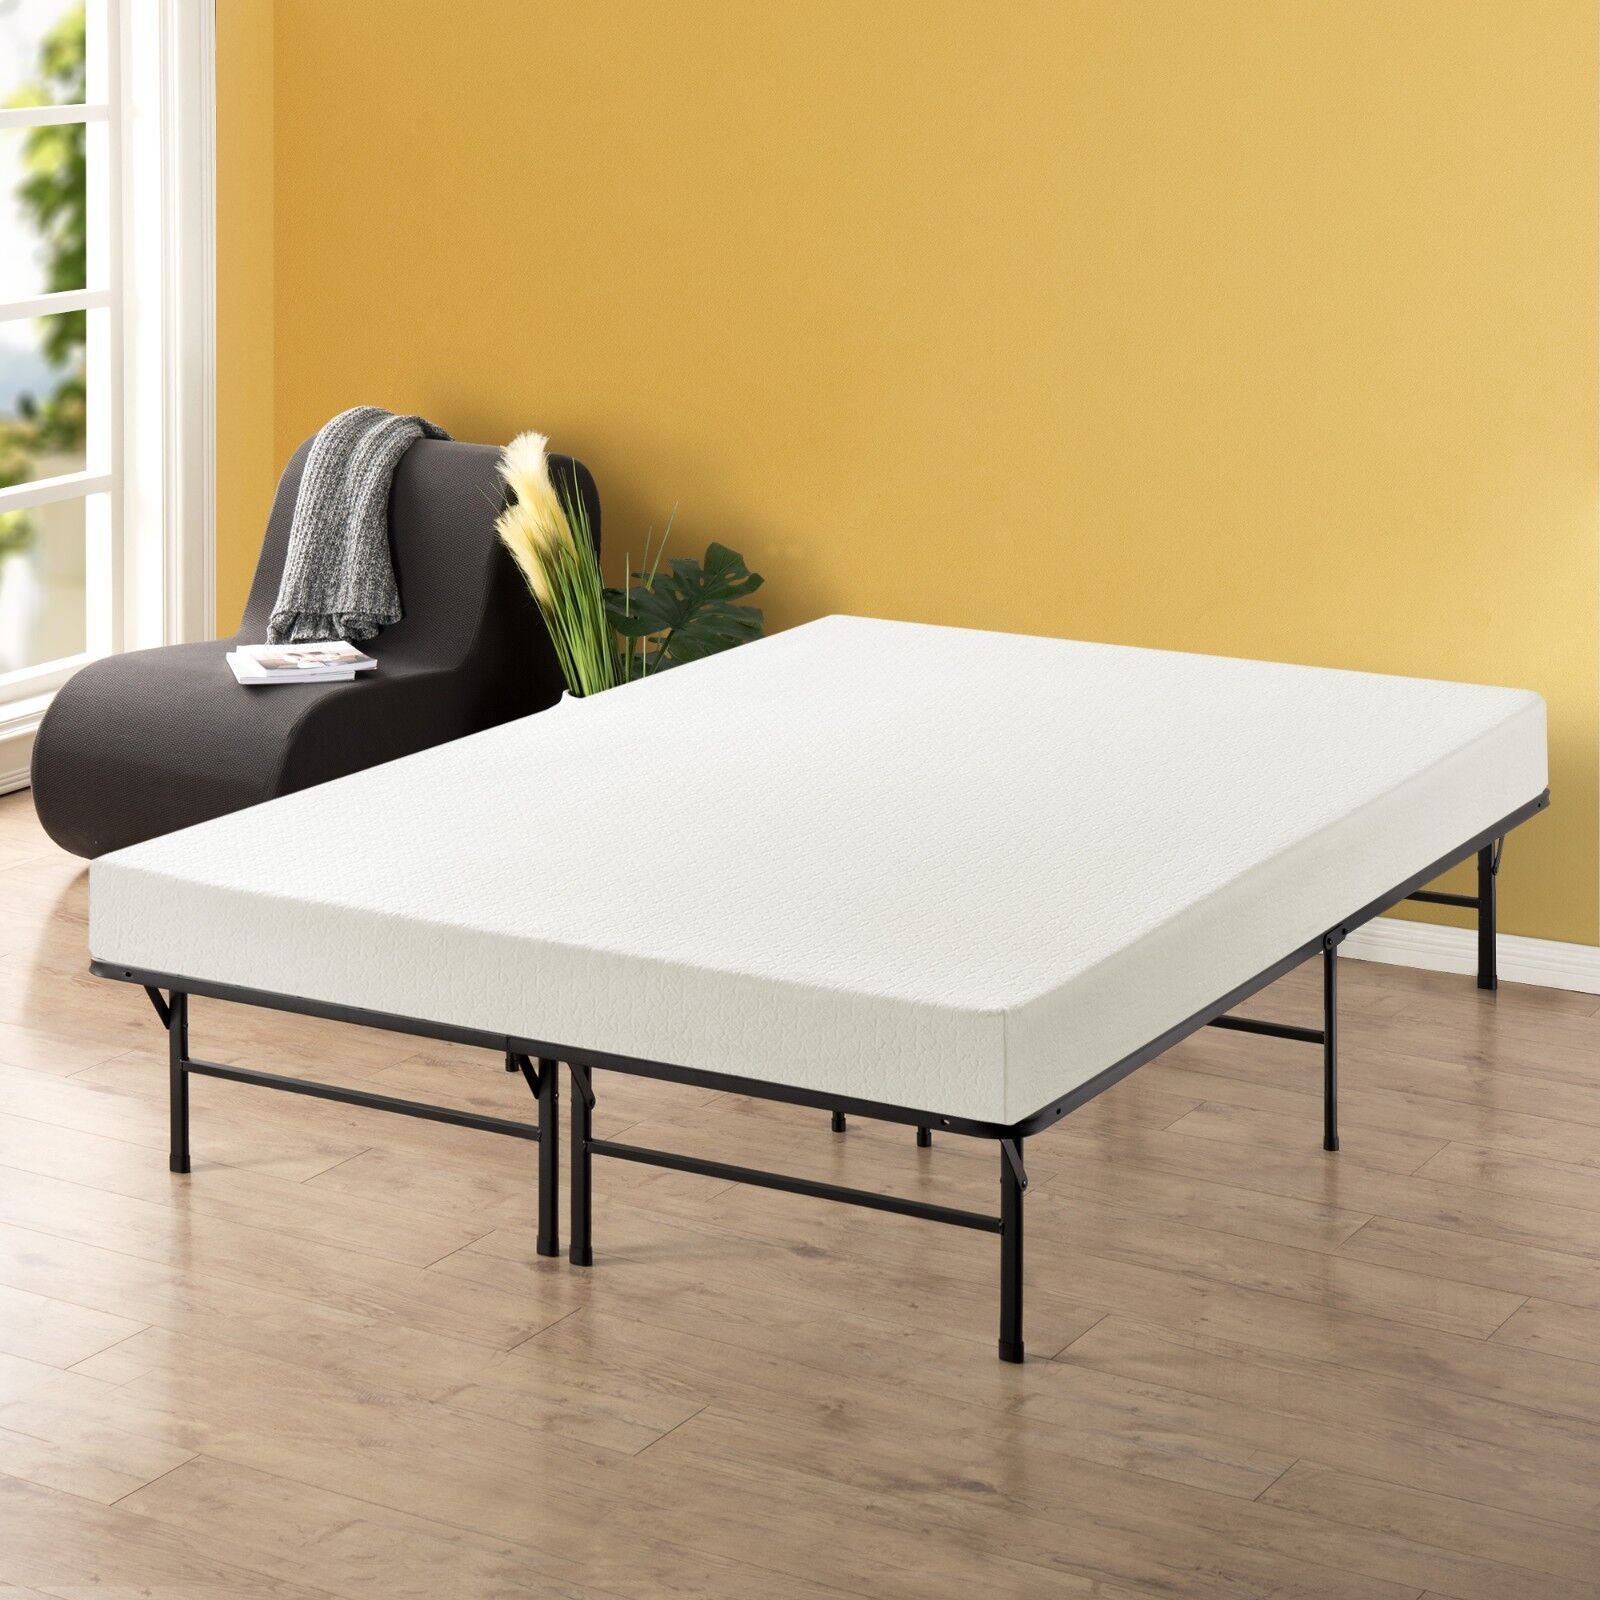 EASYSETUP BiFold Sturdy Steel Metal Platform Bed Frame Twin